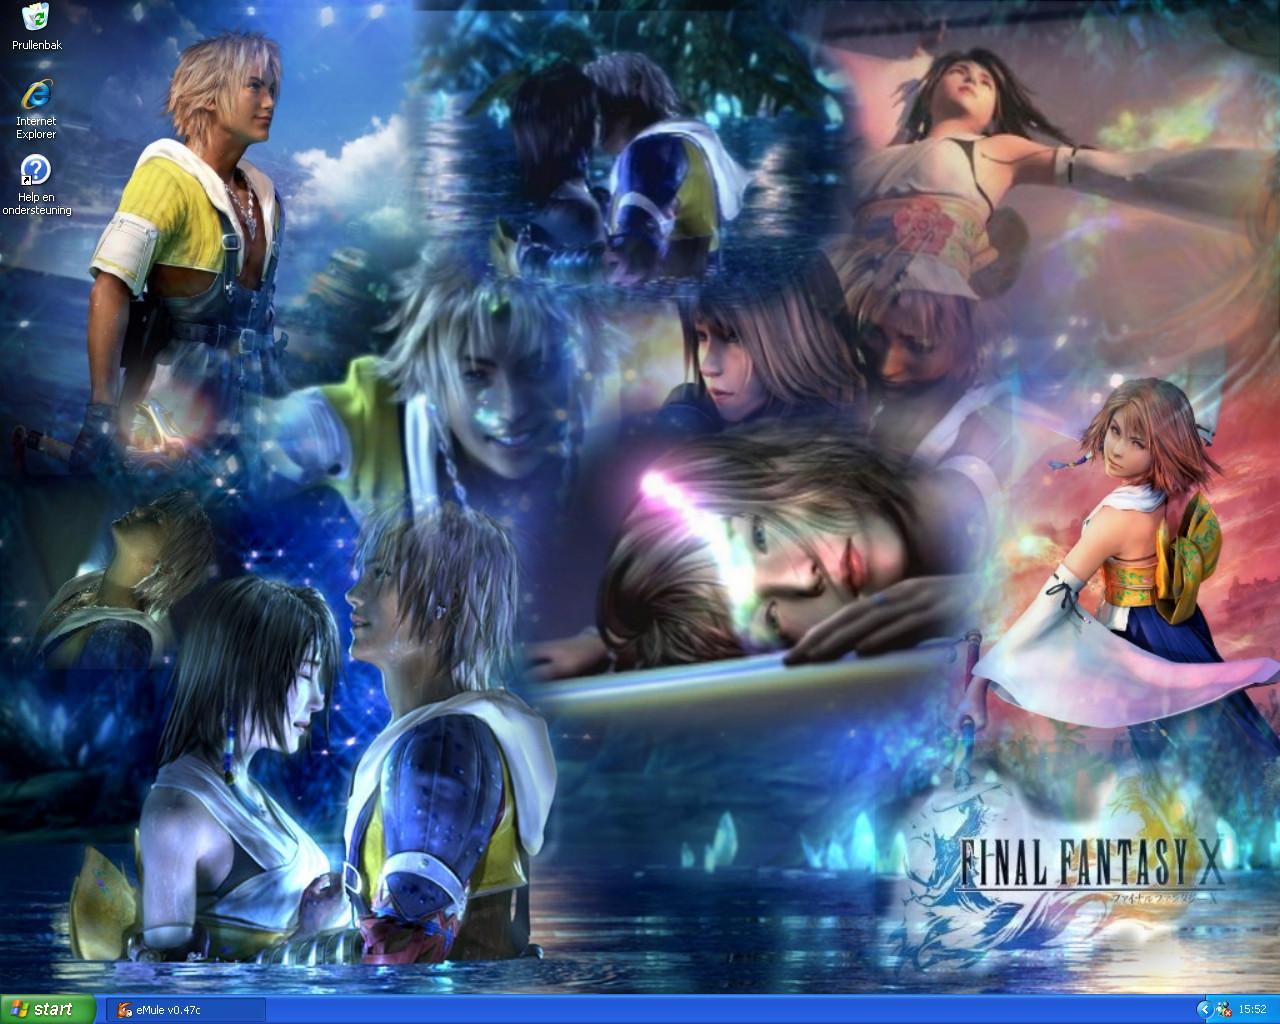 Final Fantasy Wallpapers   Taringa 1280x1024